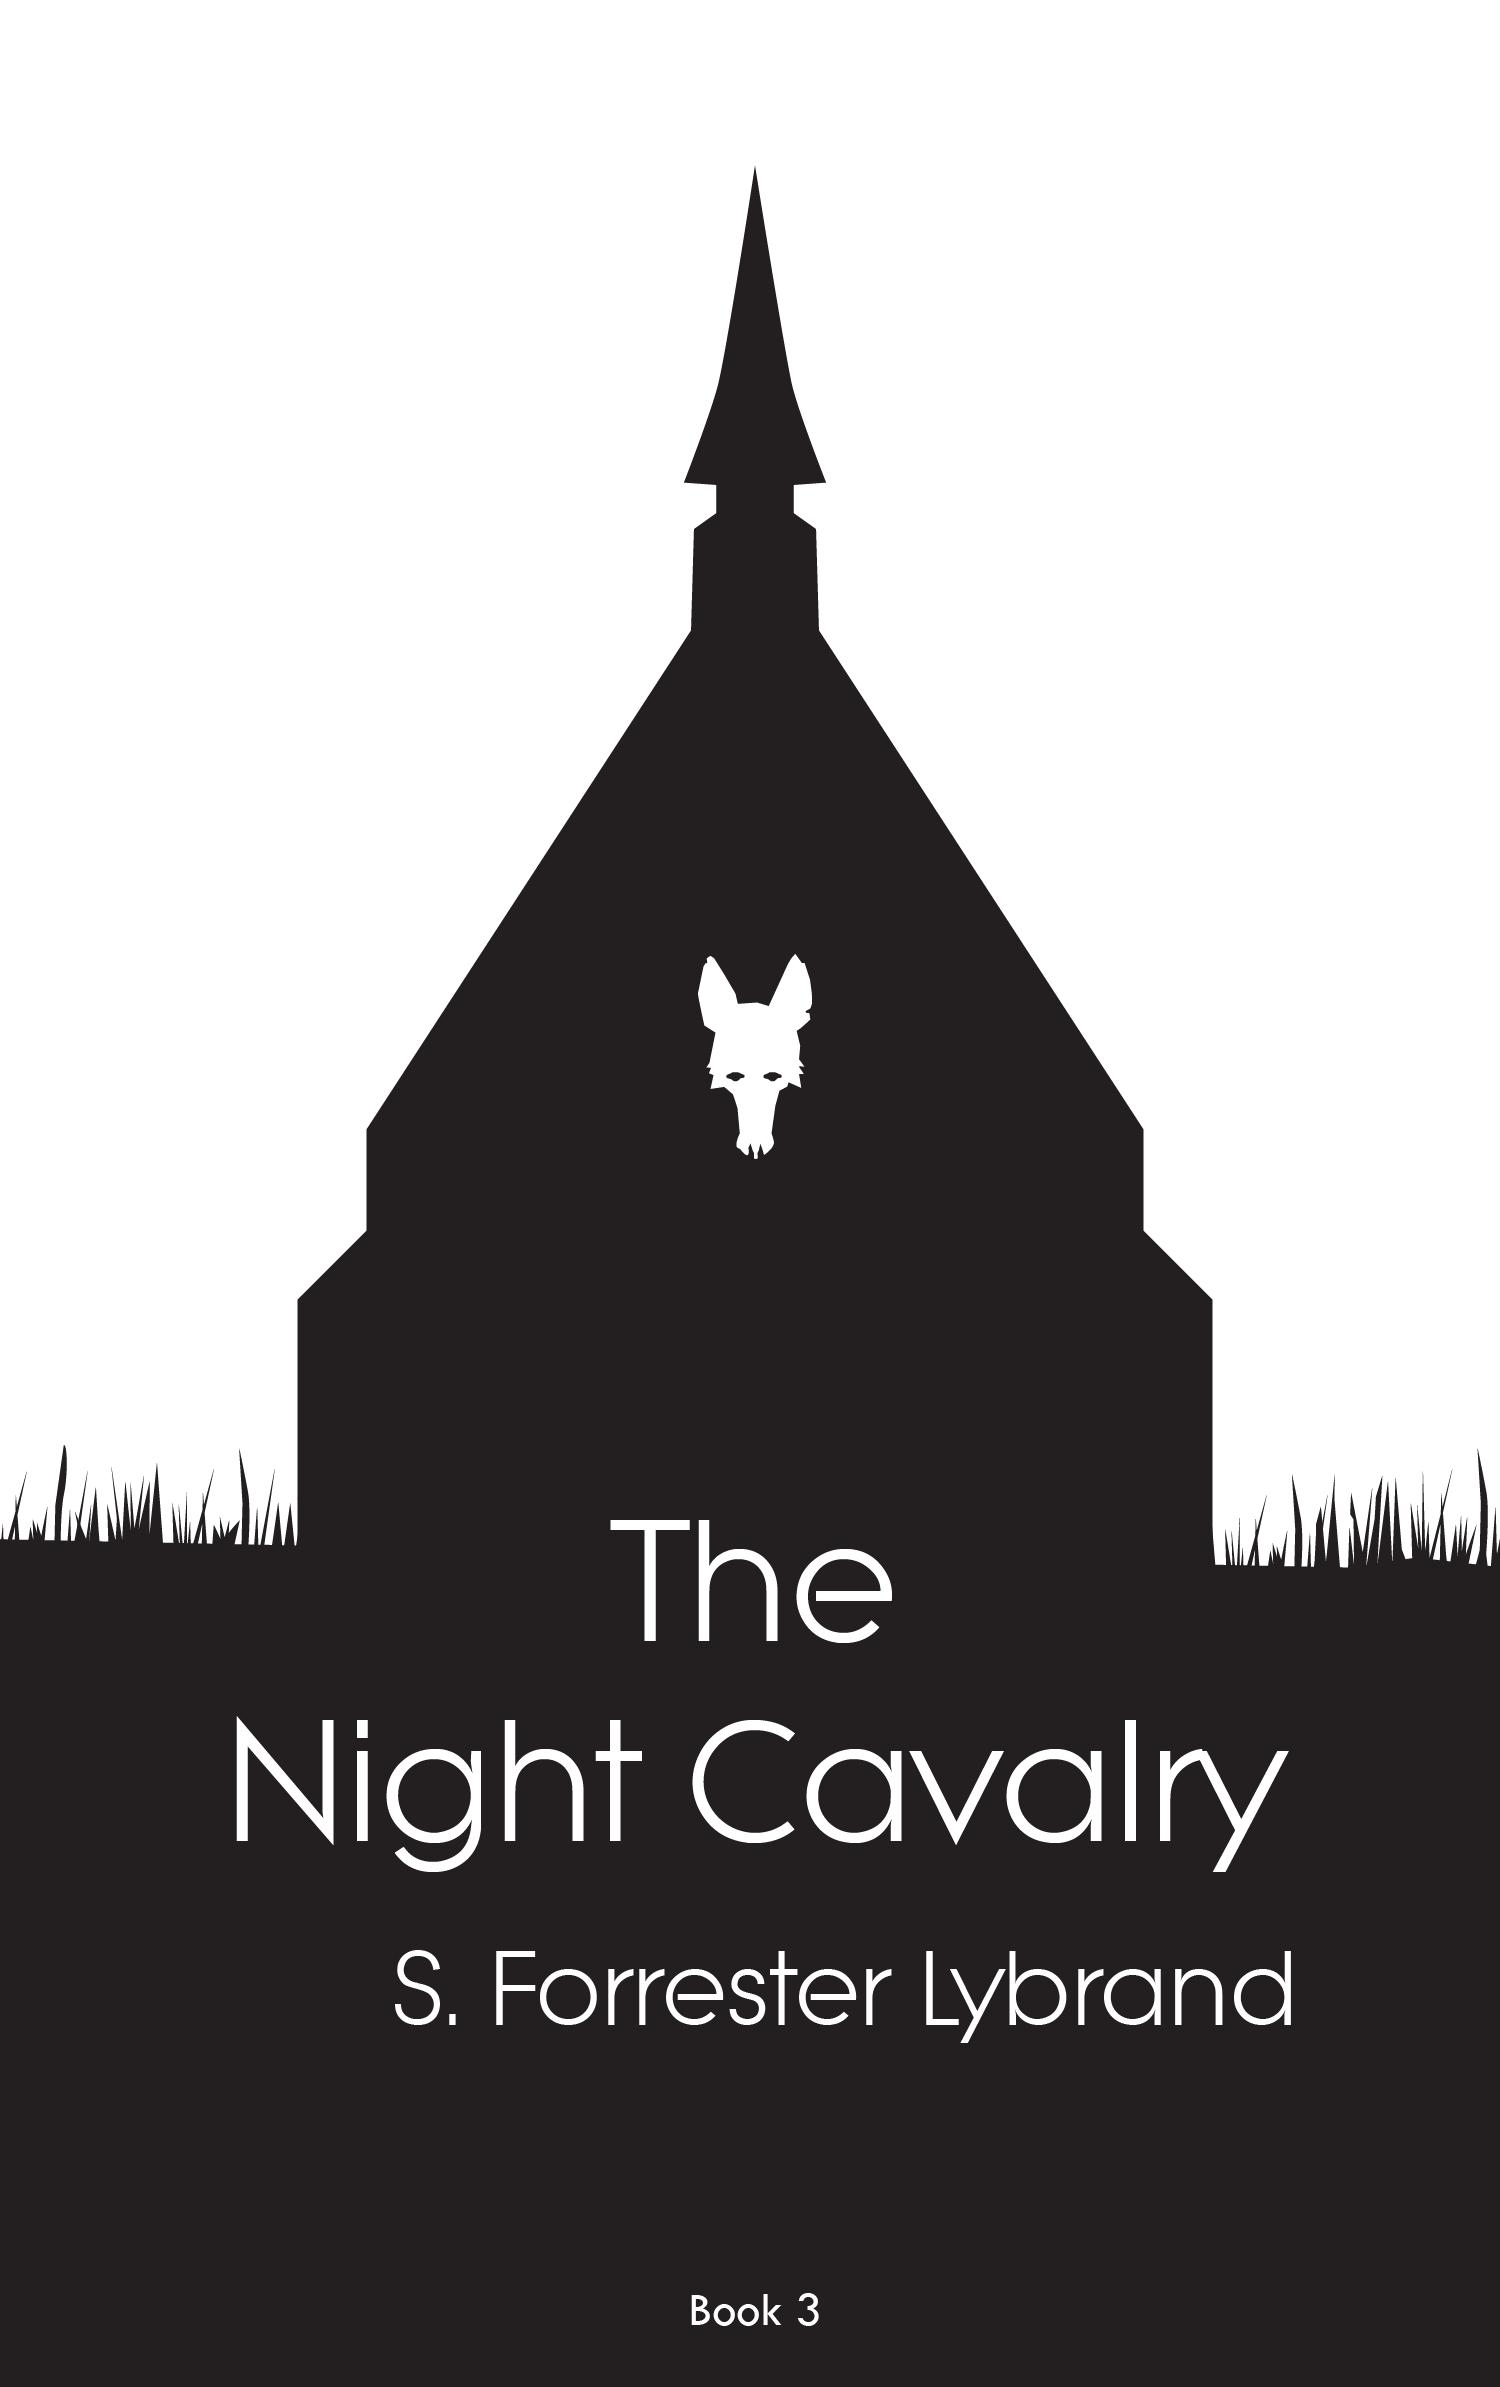 The Night Cavalry